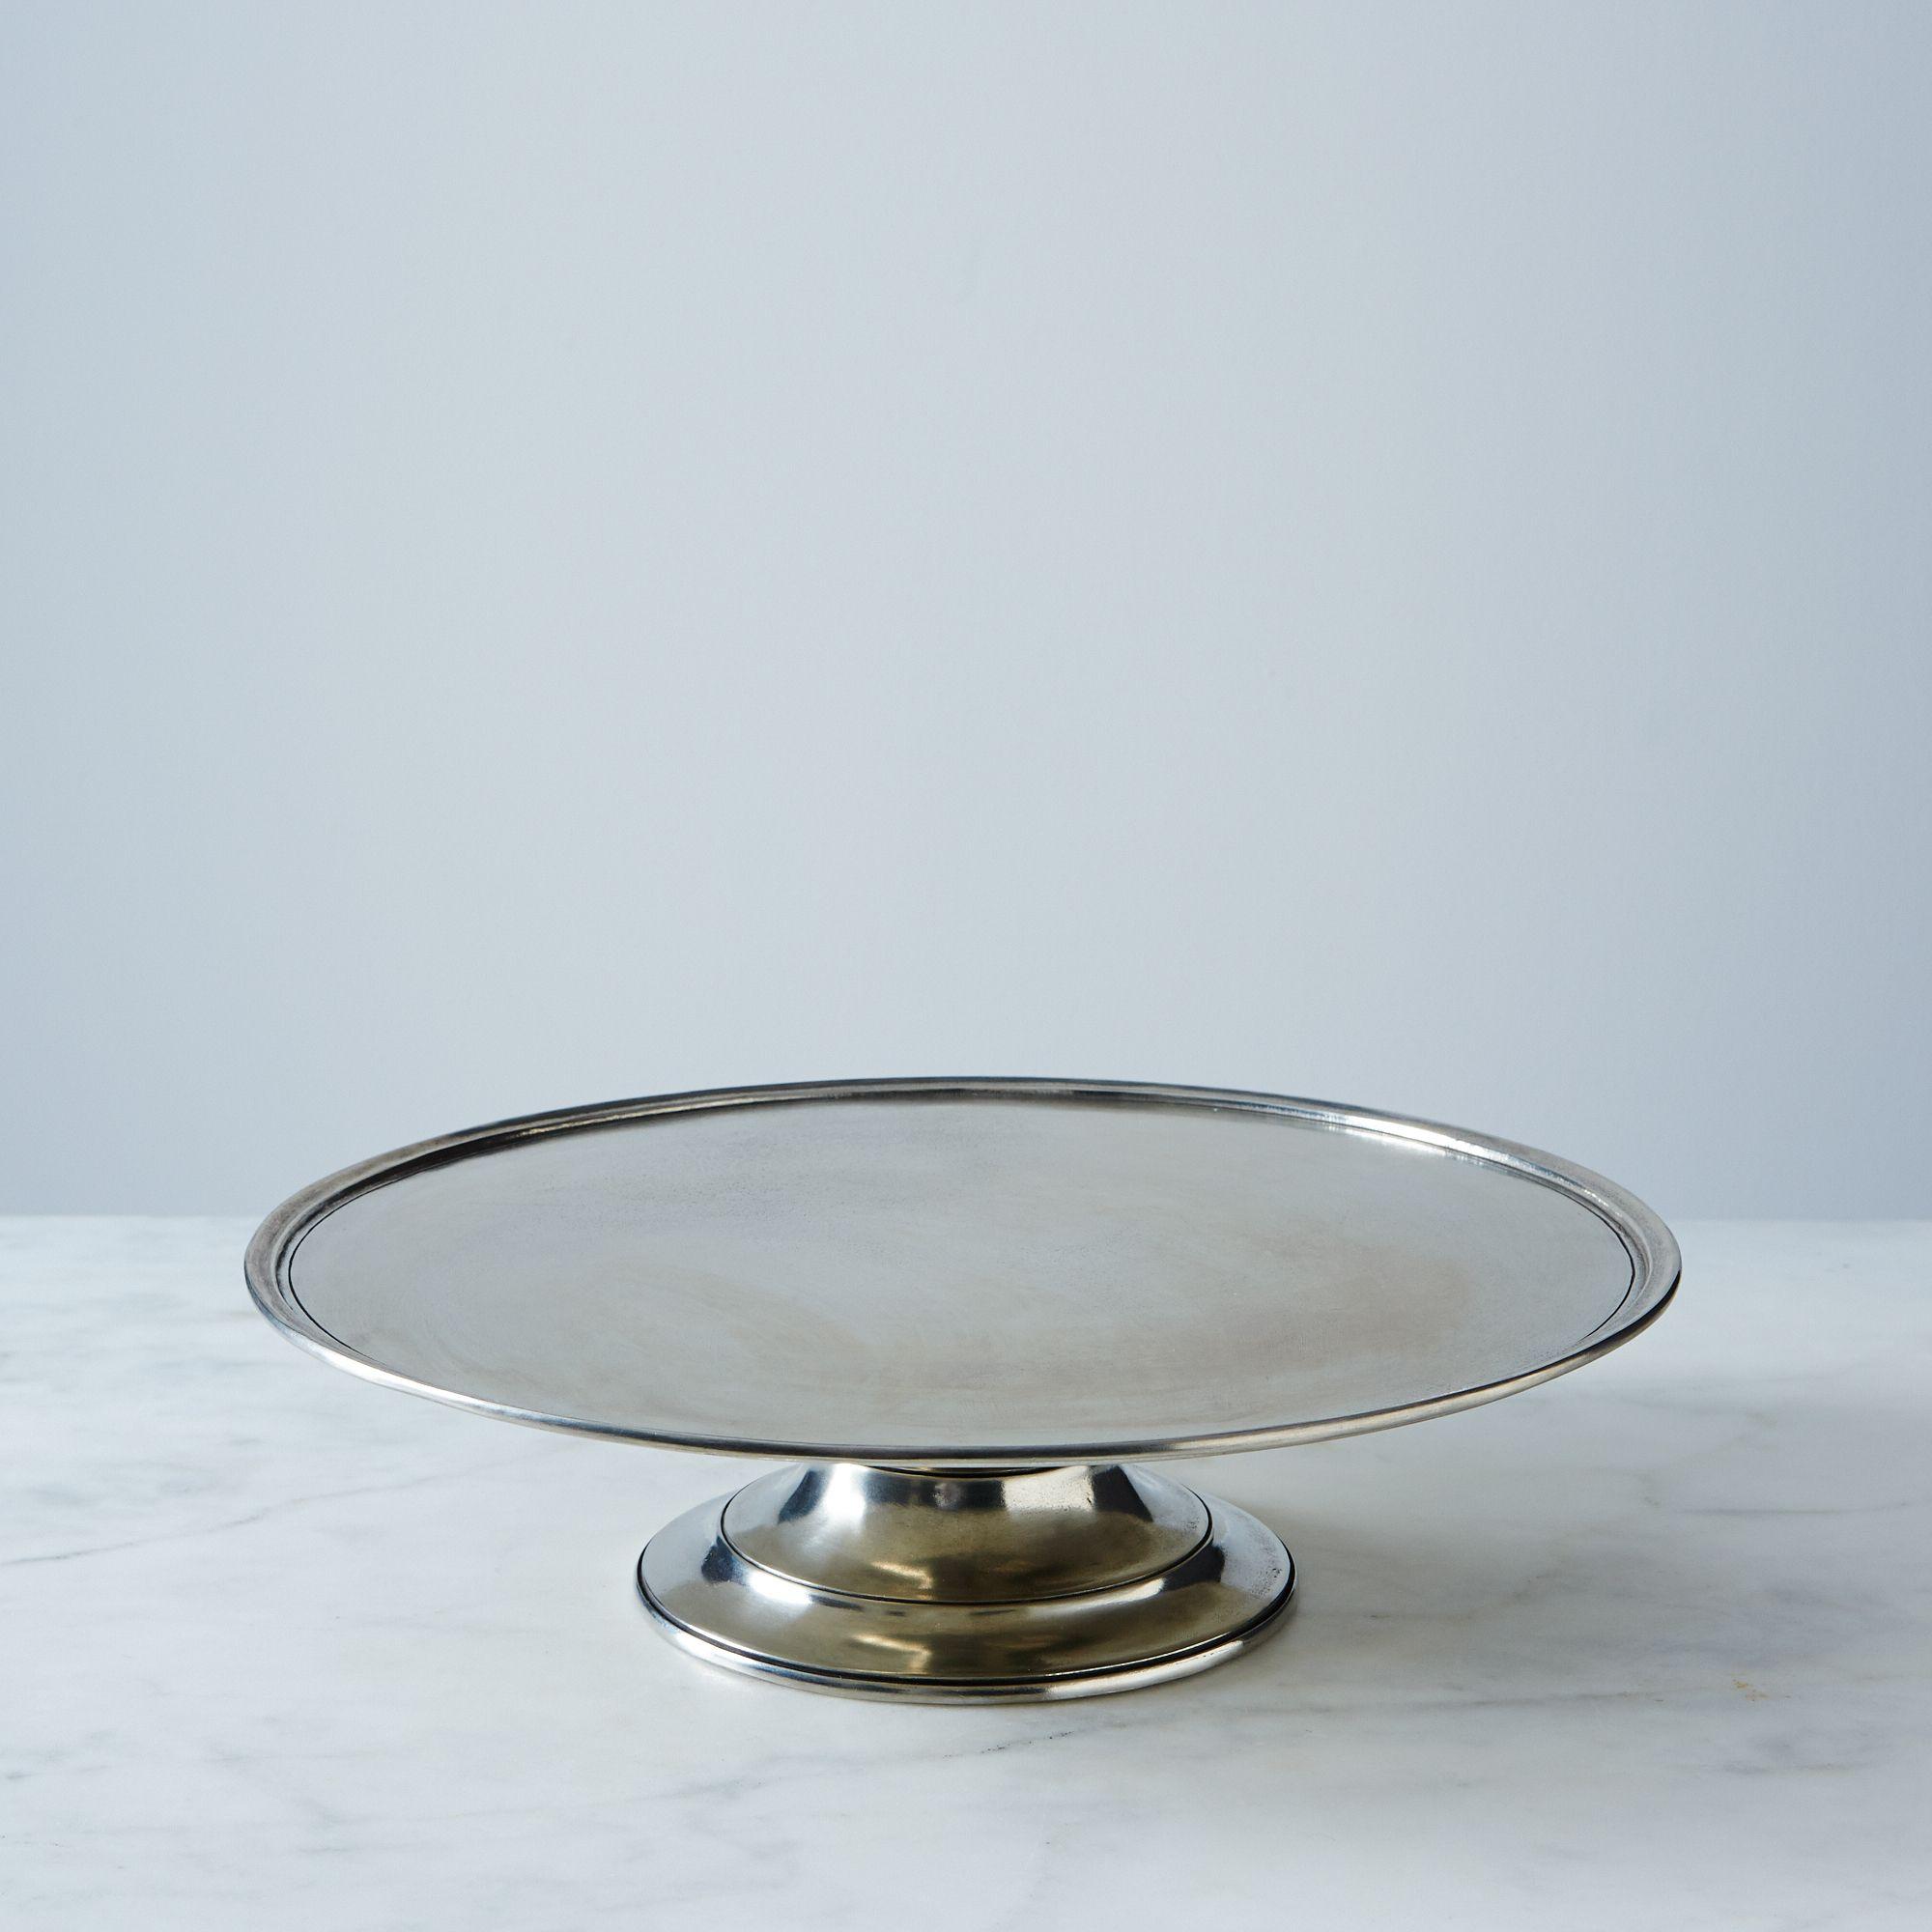 9023f44f 0266 4539 8837 43f01d5bf904  match cake plate silo provisions mark weinberg 13 12 12 0756